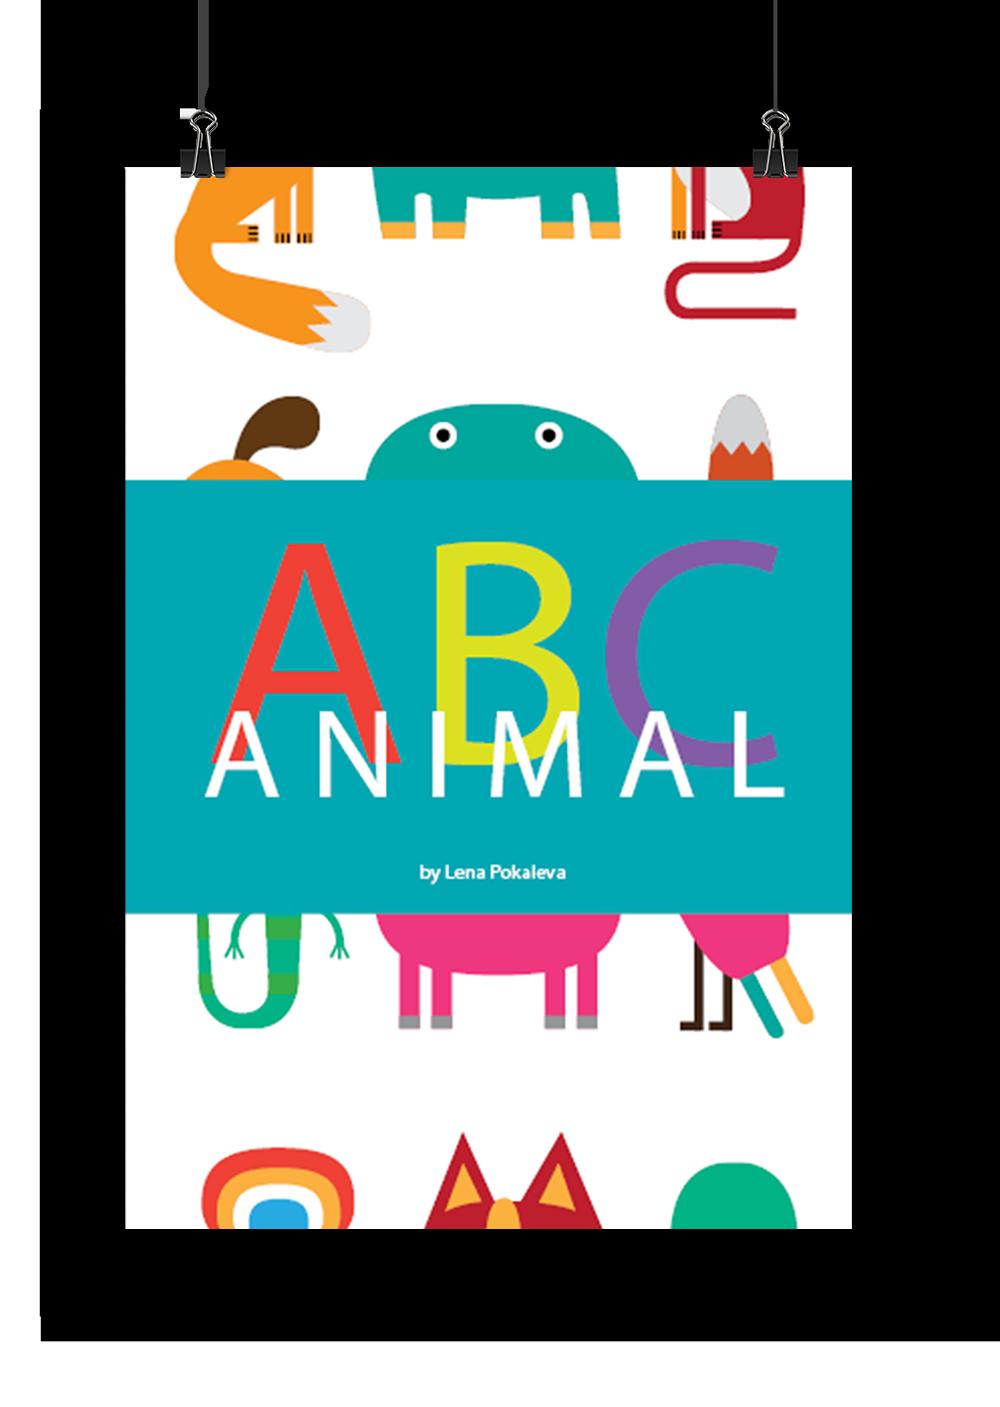 Yak clipart alphabet animal. Abc book on behance